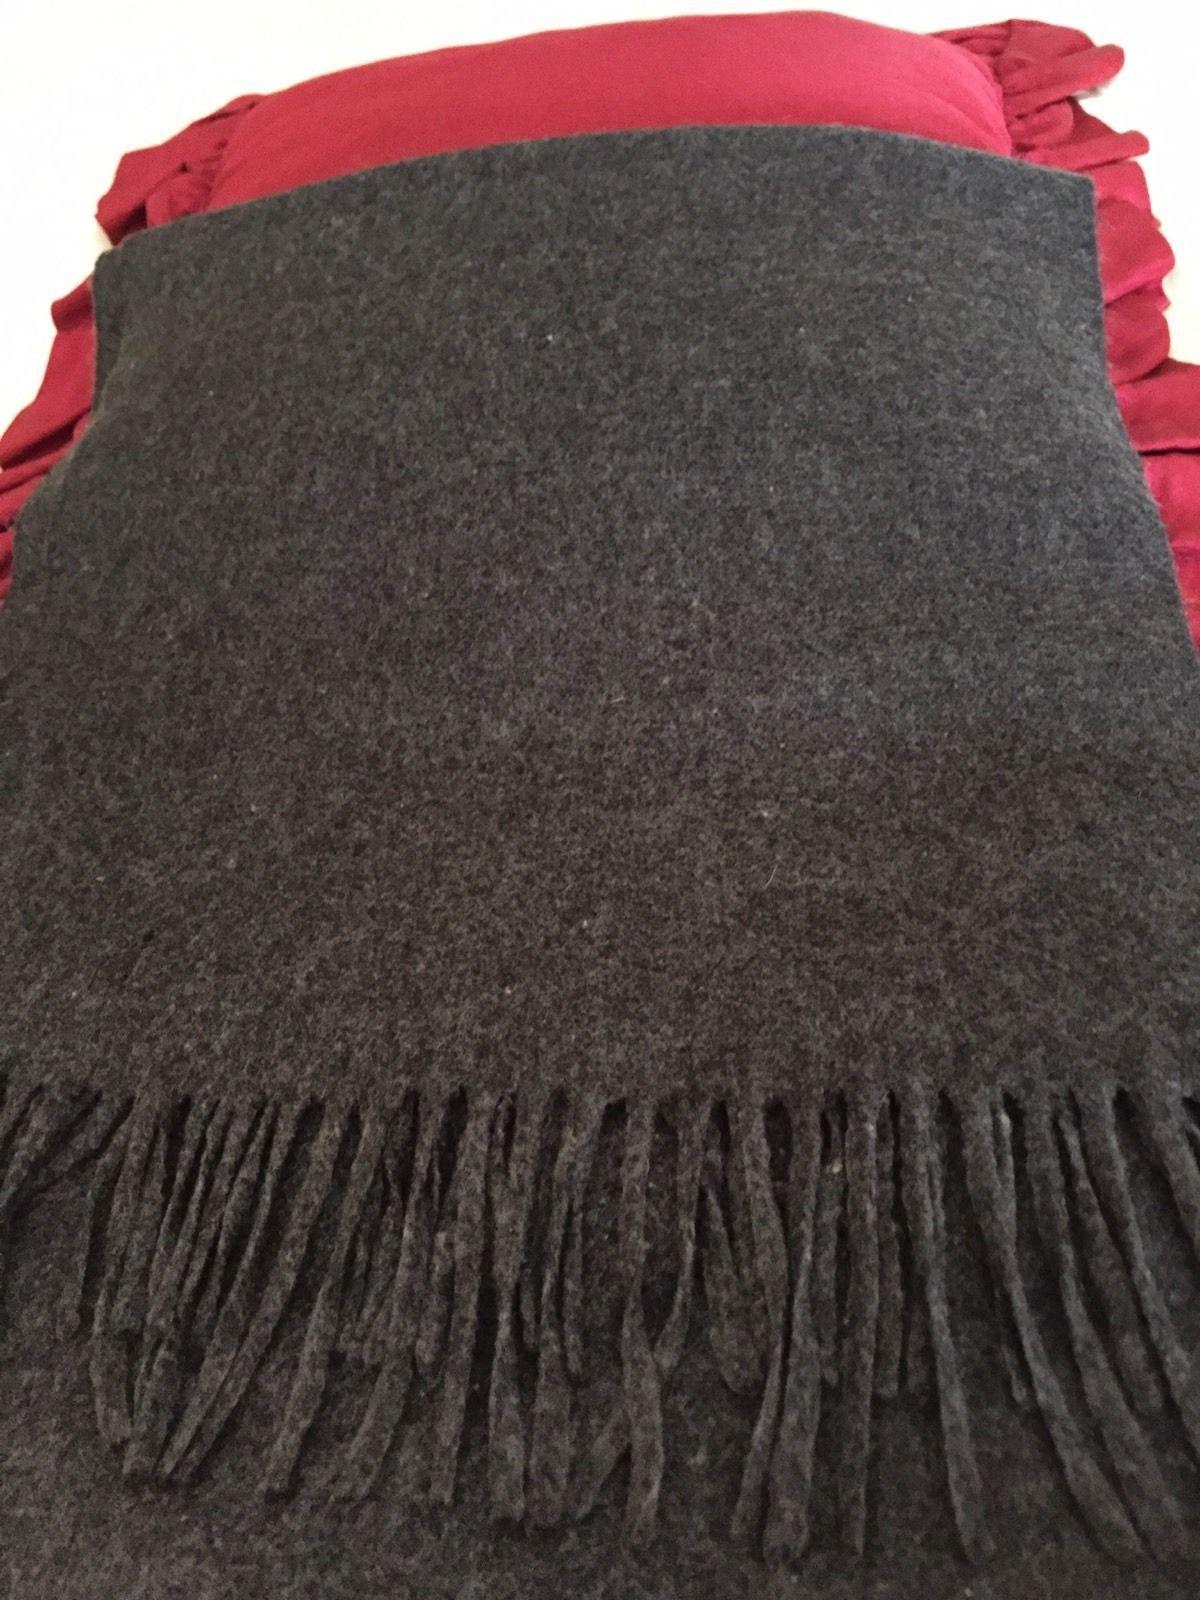 "Women's~ CASHLUXE~ Charcoal Gray Scarf w/Fringe Lg. Size 14.5""X74"" EUC/Acrylic"